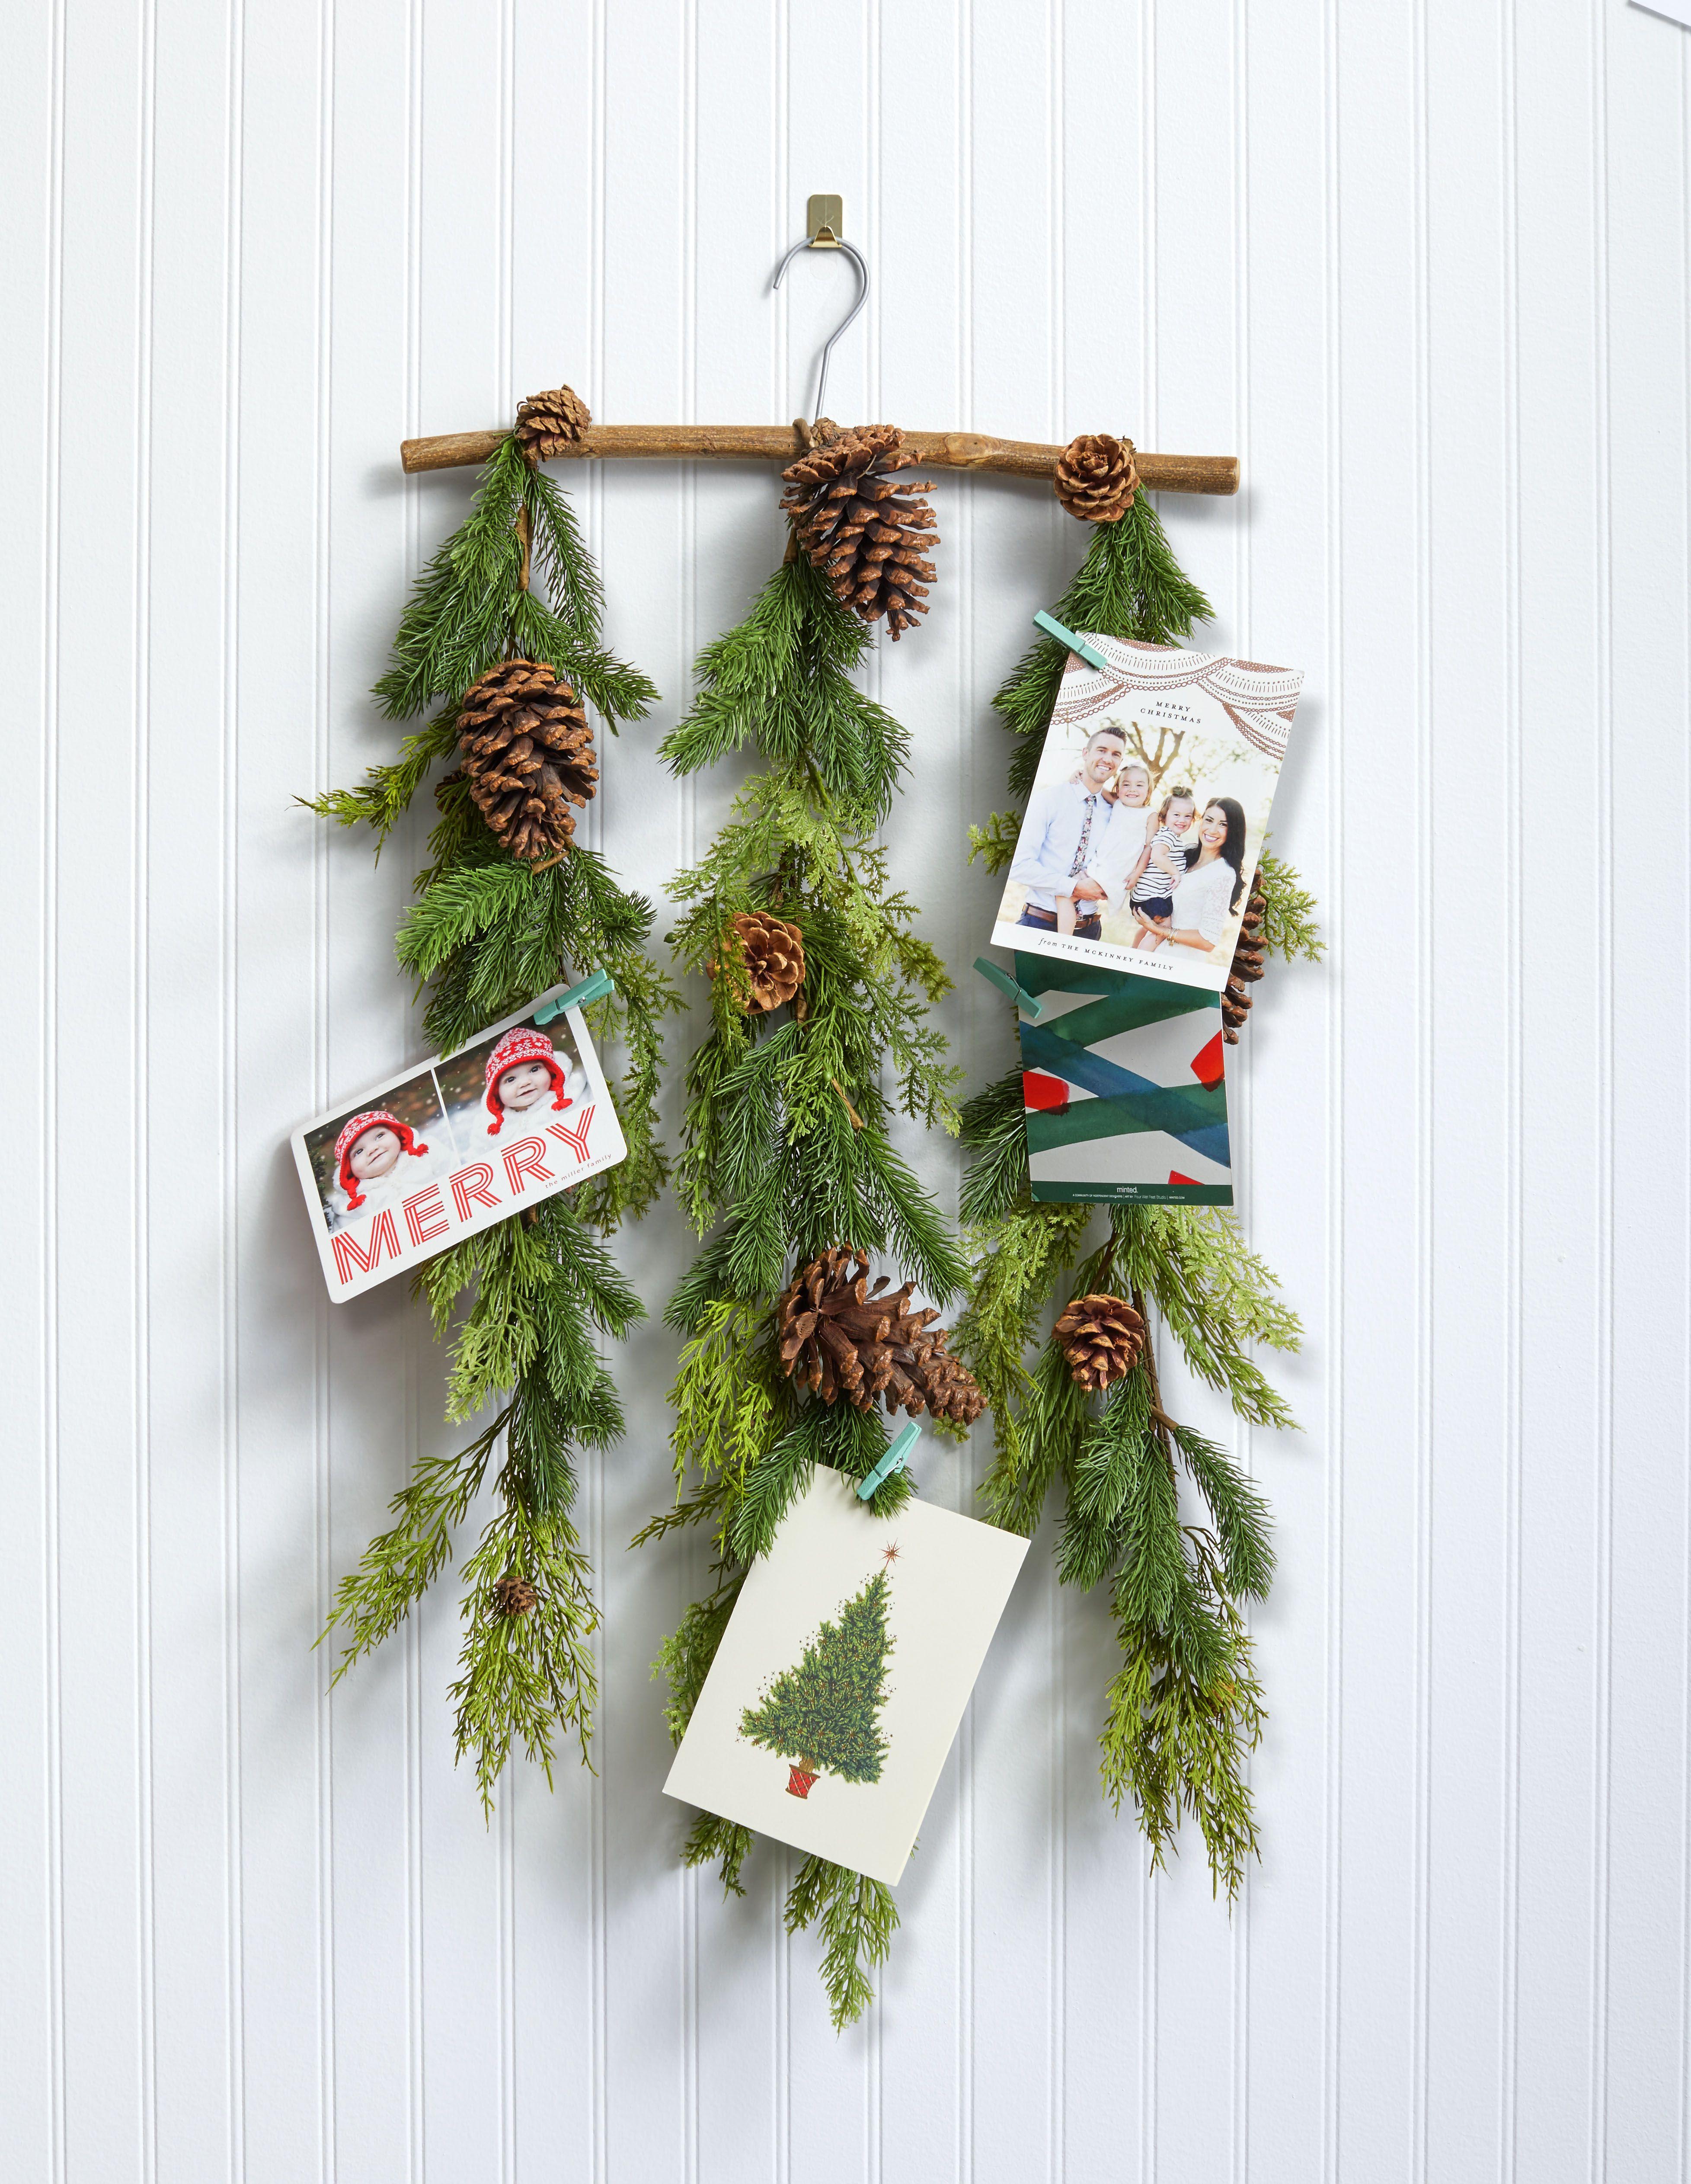 45 Easy Diy Christmas Decorations 2019 Homemade Holiday